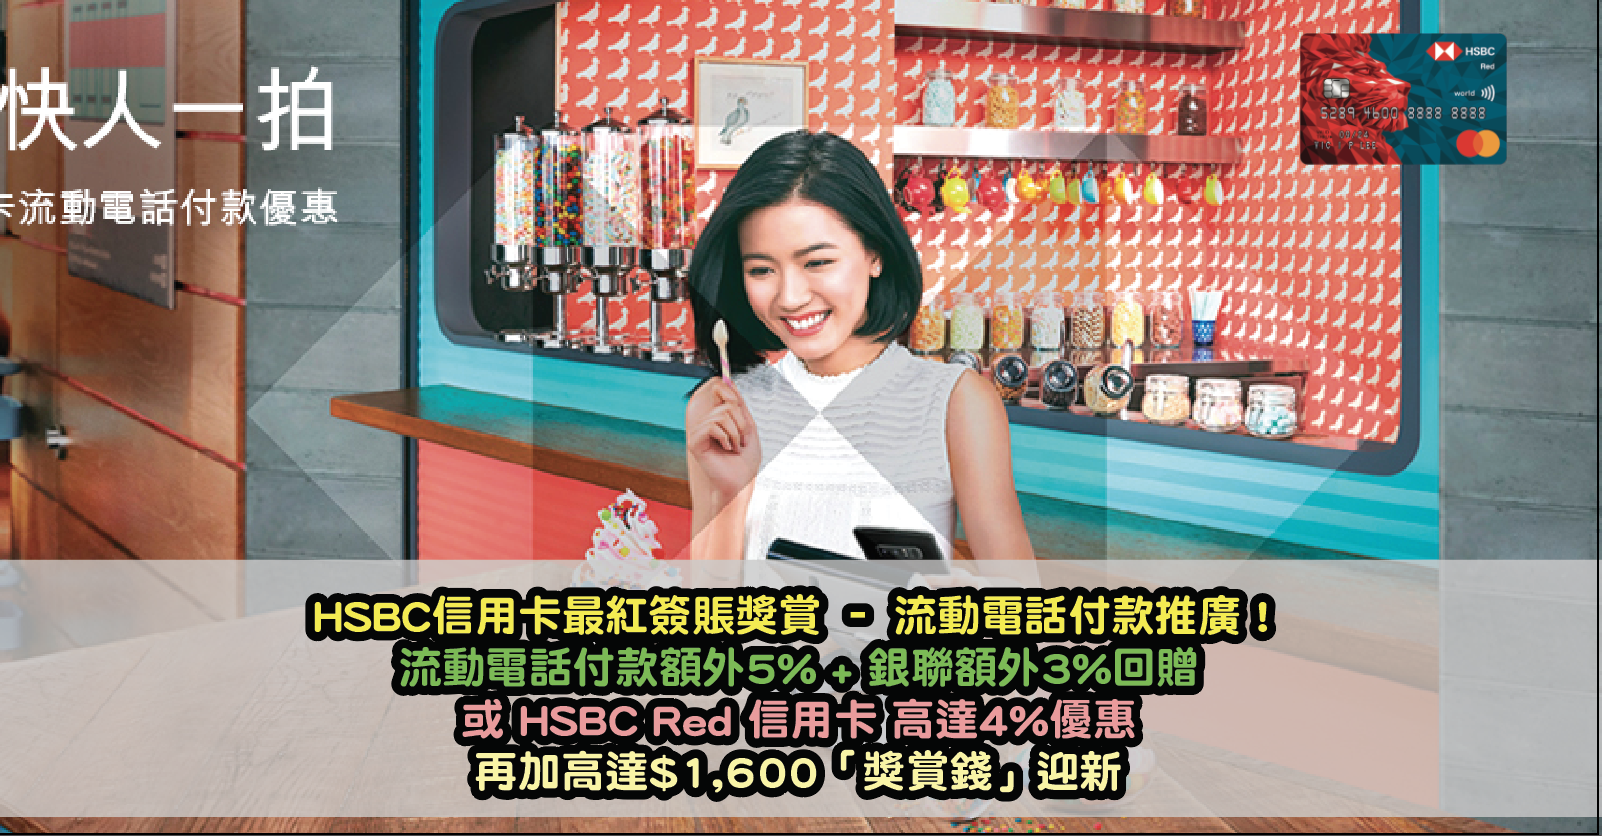 HSBC信用卡最紅簽賬獎賞 – 流動電話付款推廣!流動電話付款額外5% + 銀聯額外3%回贈 或 HSBC Red 信用卡 高達4%優惠再加高達$1,600「獎賞錢」迎新